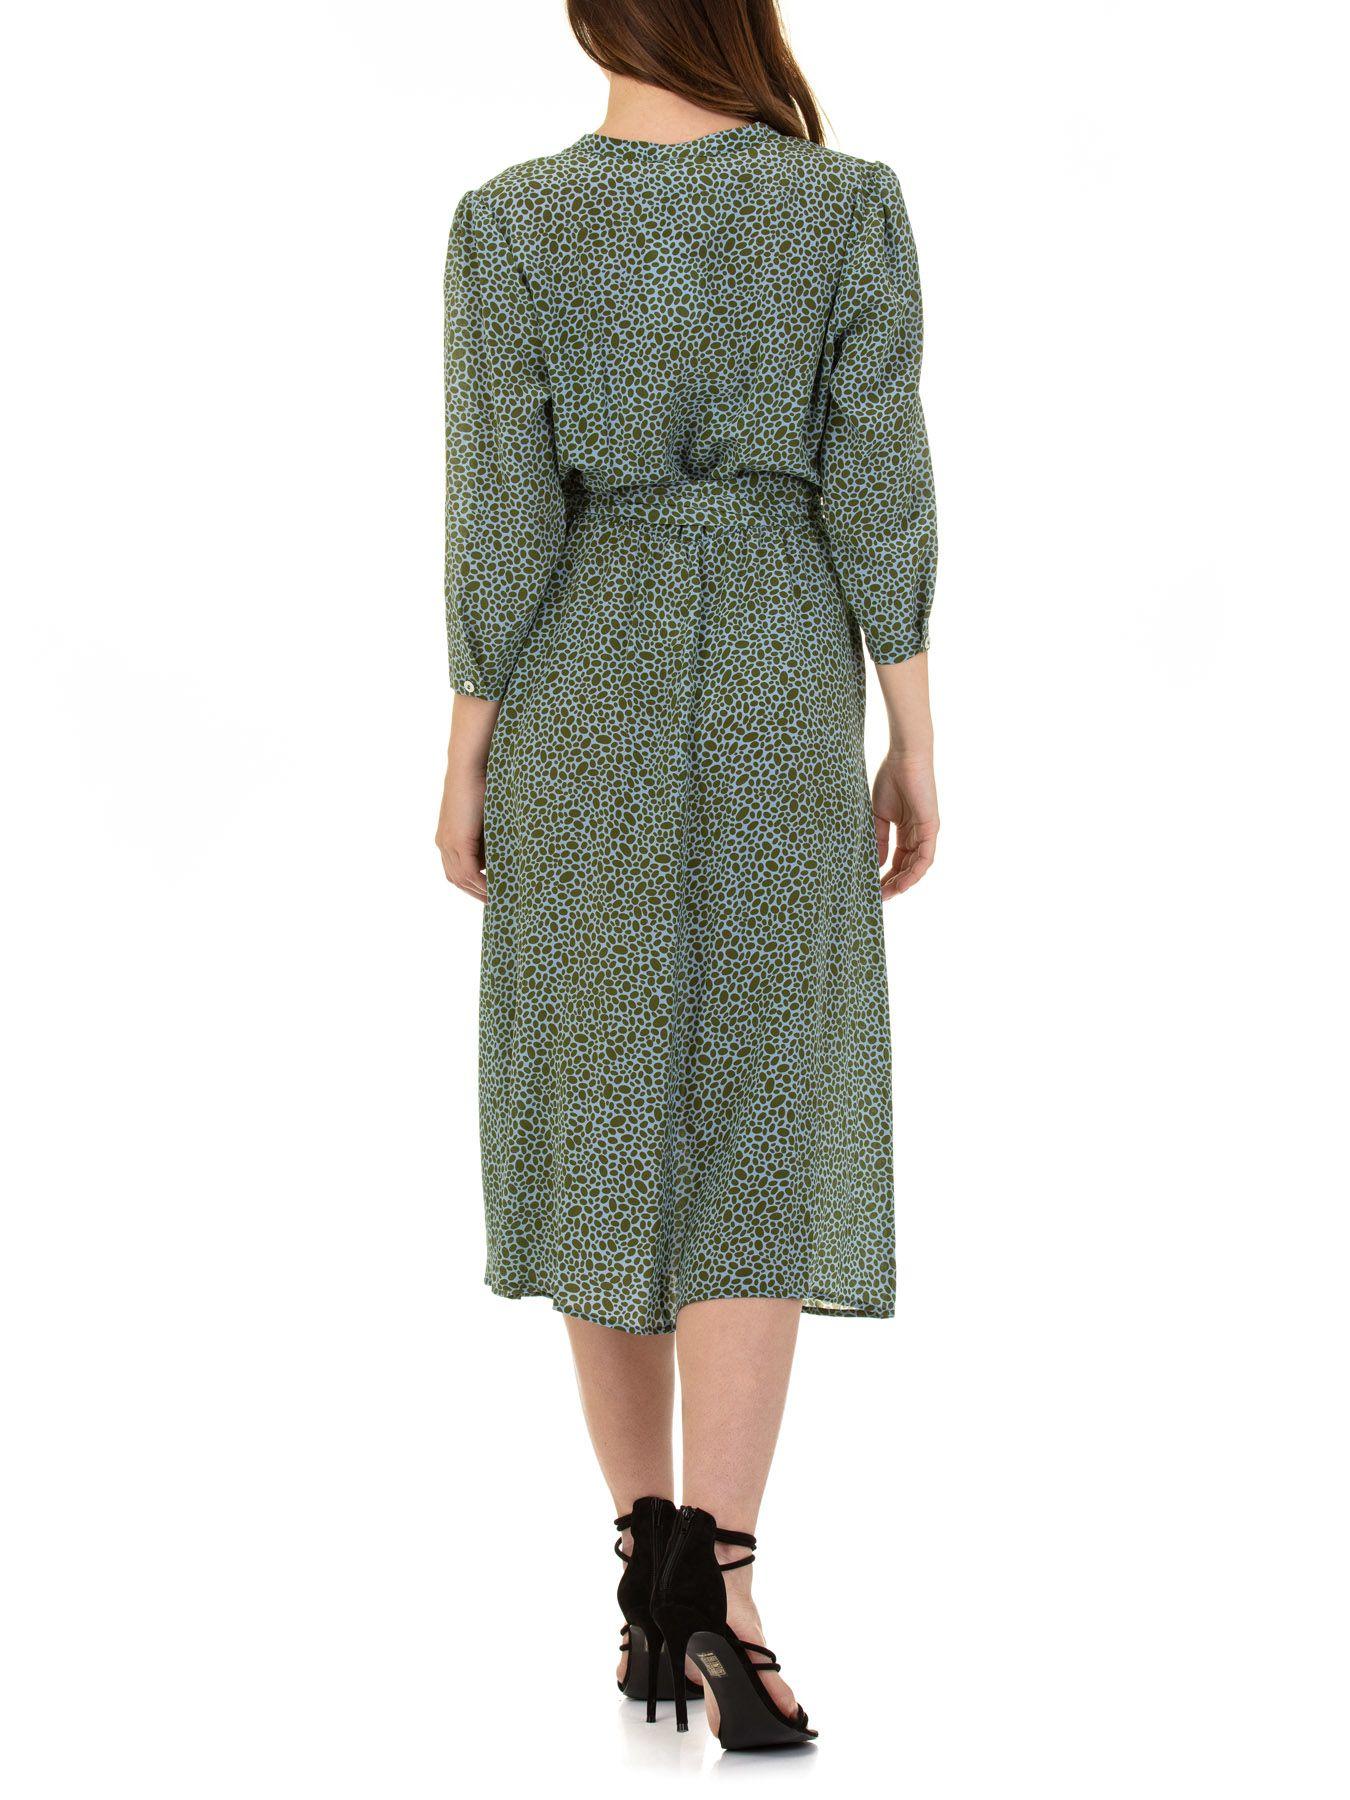 Attic and Barn Attic and Barn Peonia Dress - Green ...